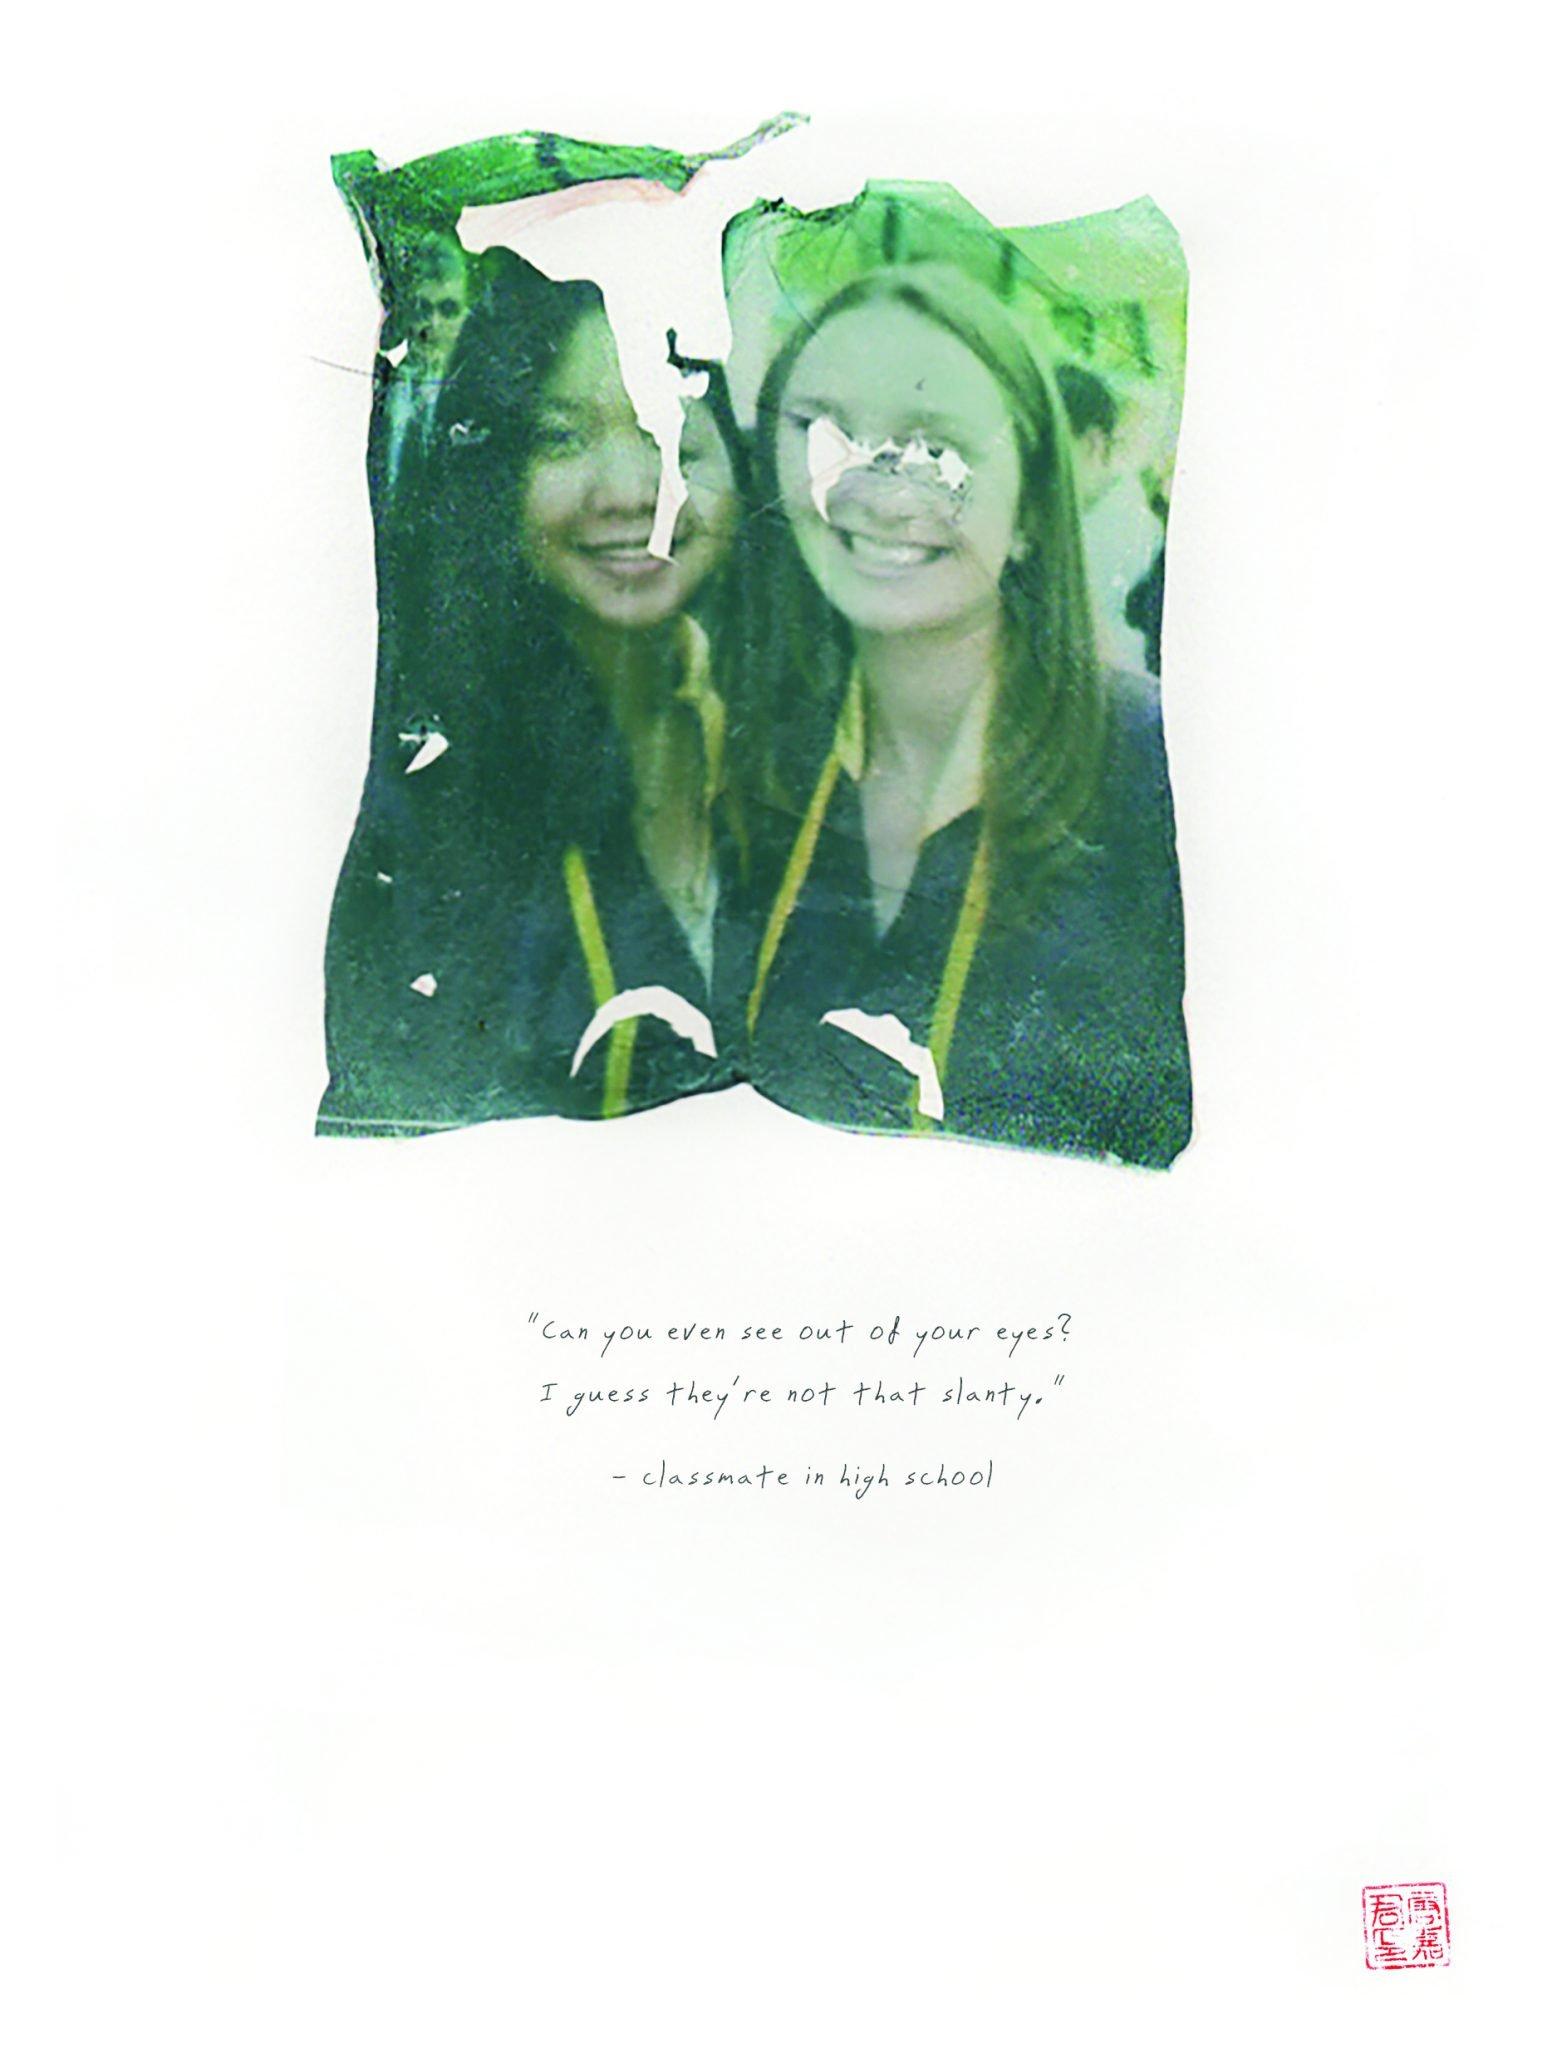 polaroid emulsion of girls at graduation